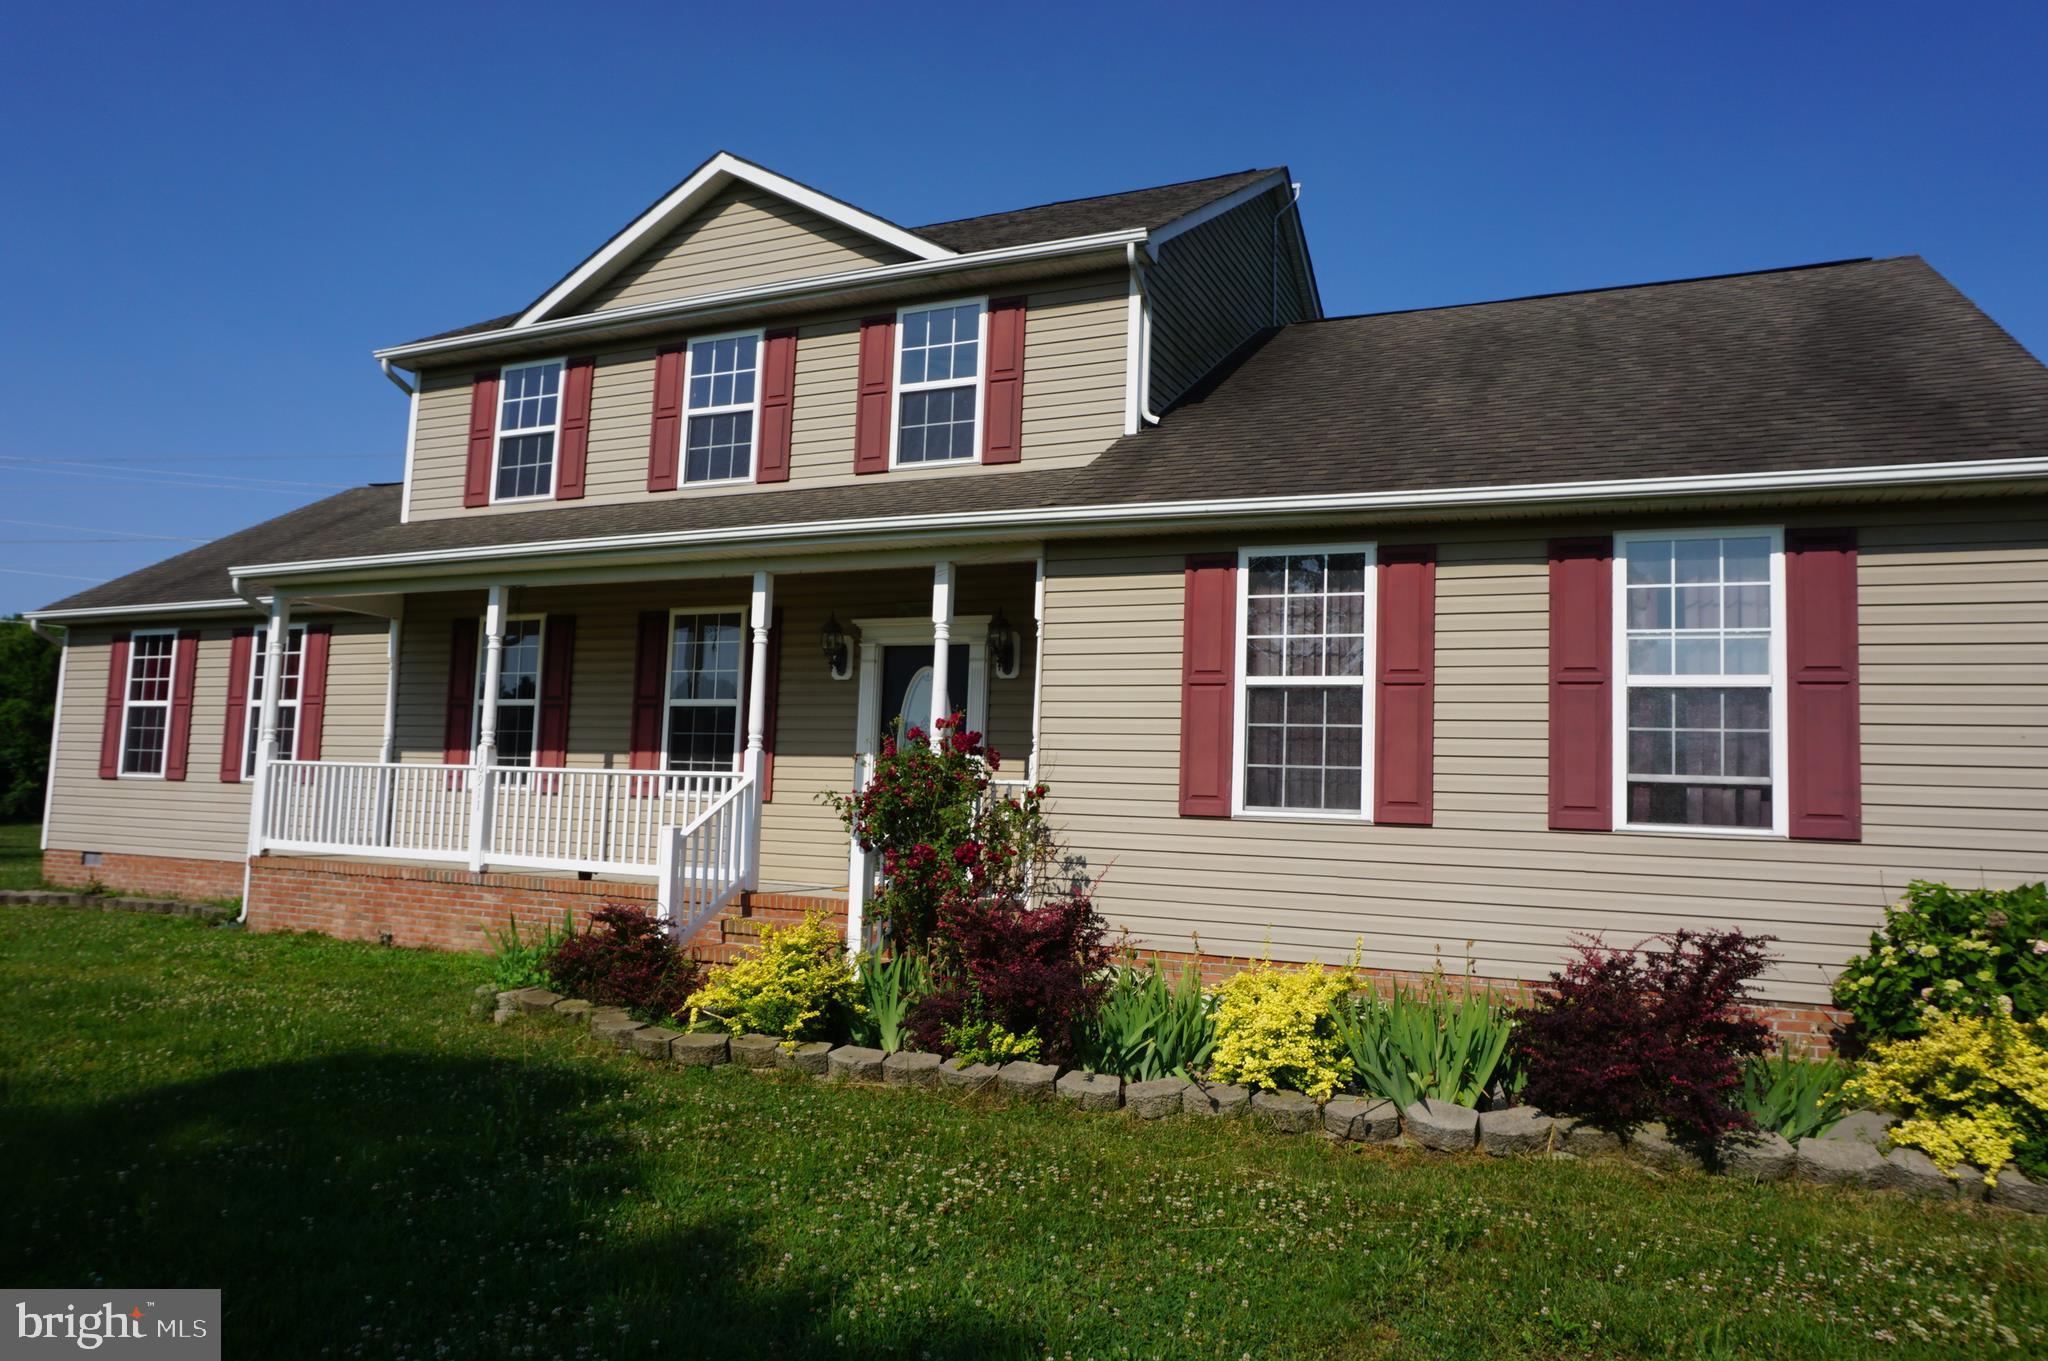 16911 HERITAGE HILLS LANE, HENDERSON, MD 21640